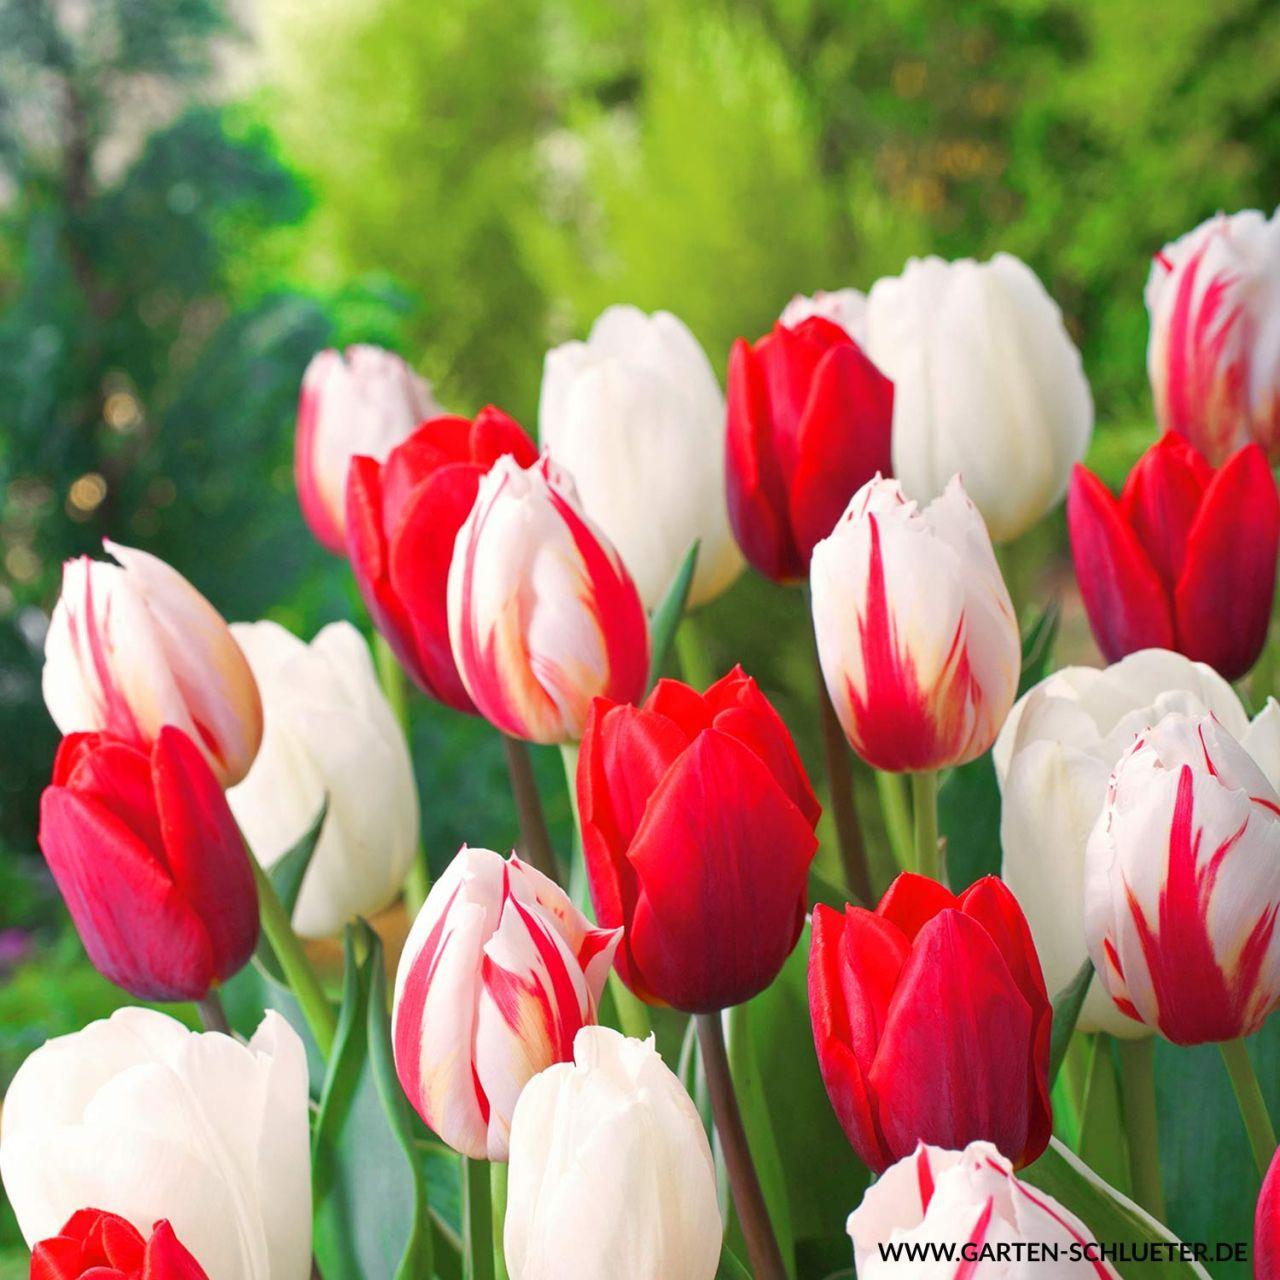 Einfache späte Tulpe 'Sorbet' - 7 Stück